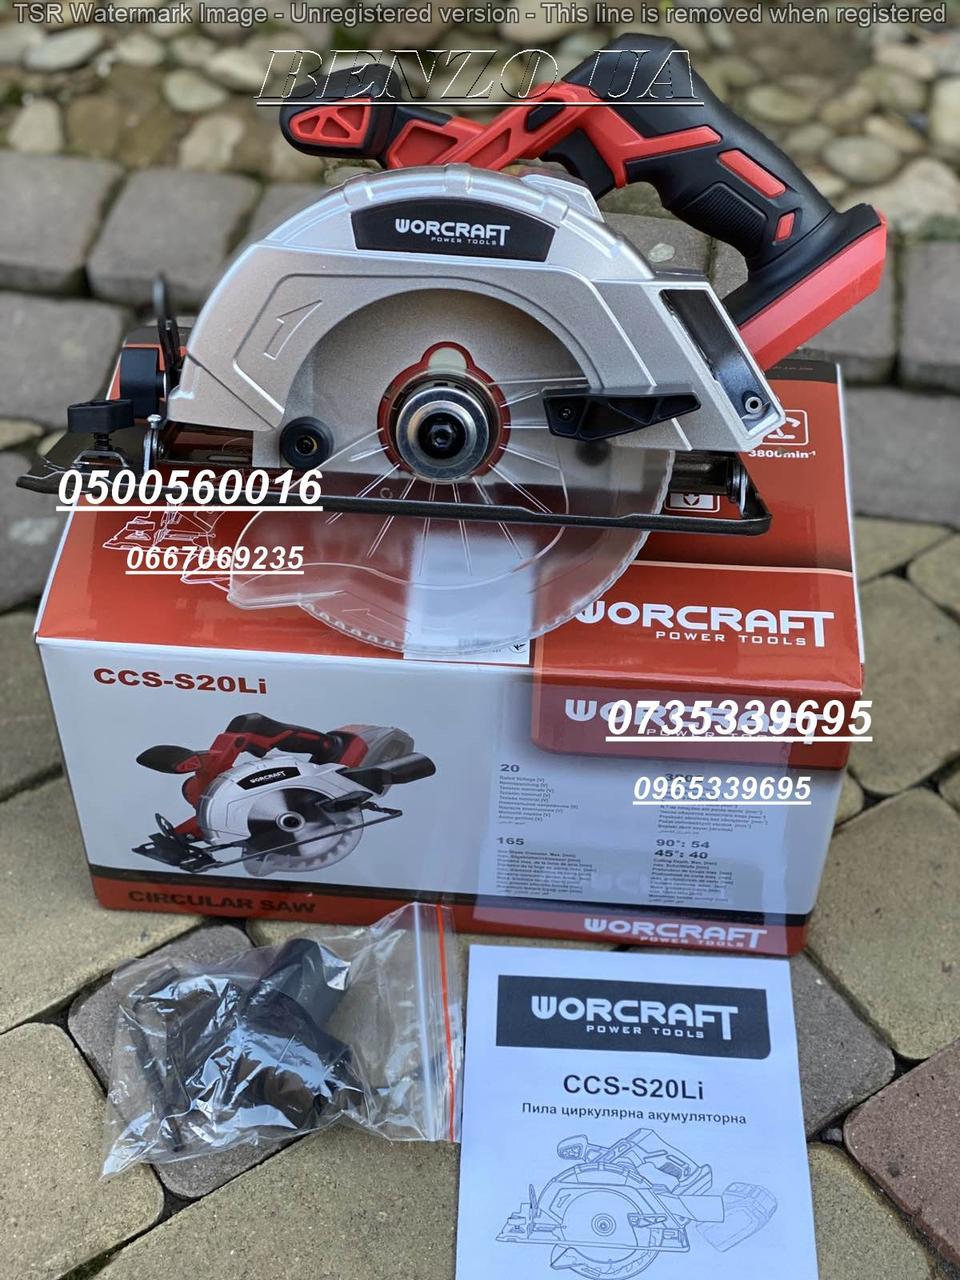 Пила циркулярная аккумуляторная Worcraft CCS-S20Li.Цена без Аккамулятора.